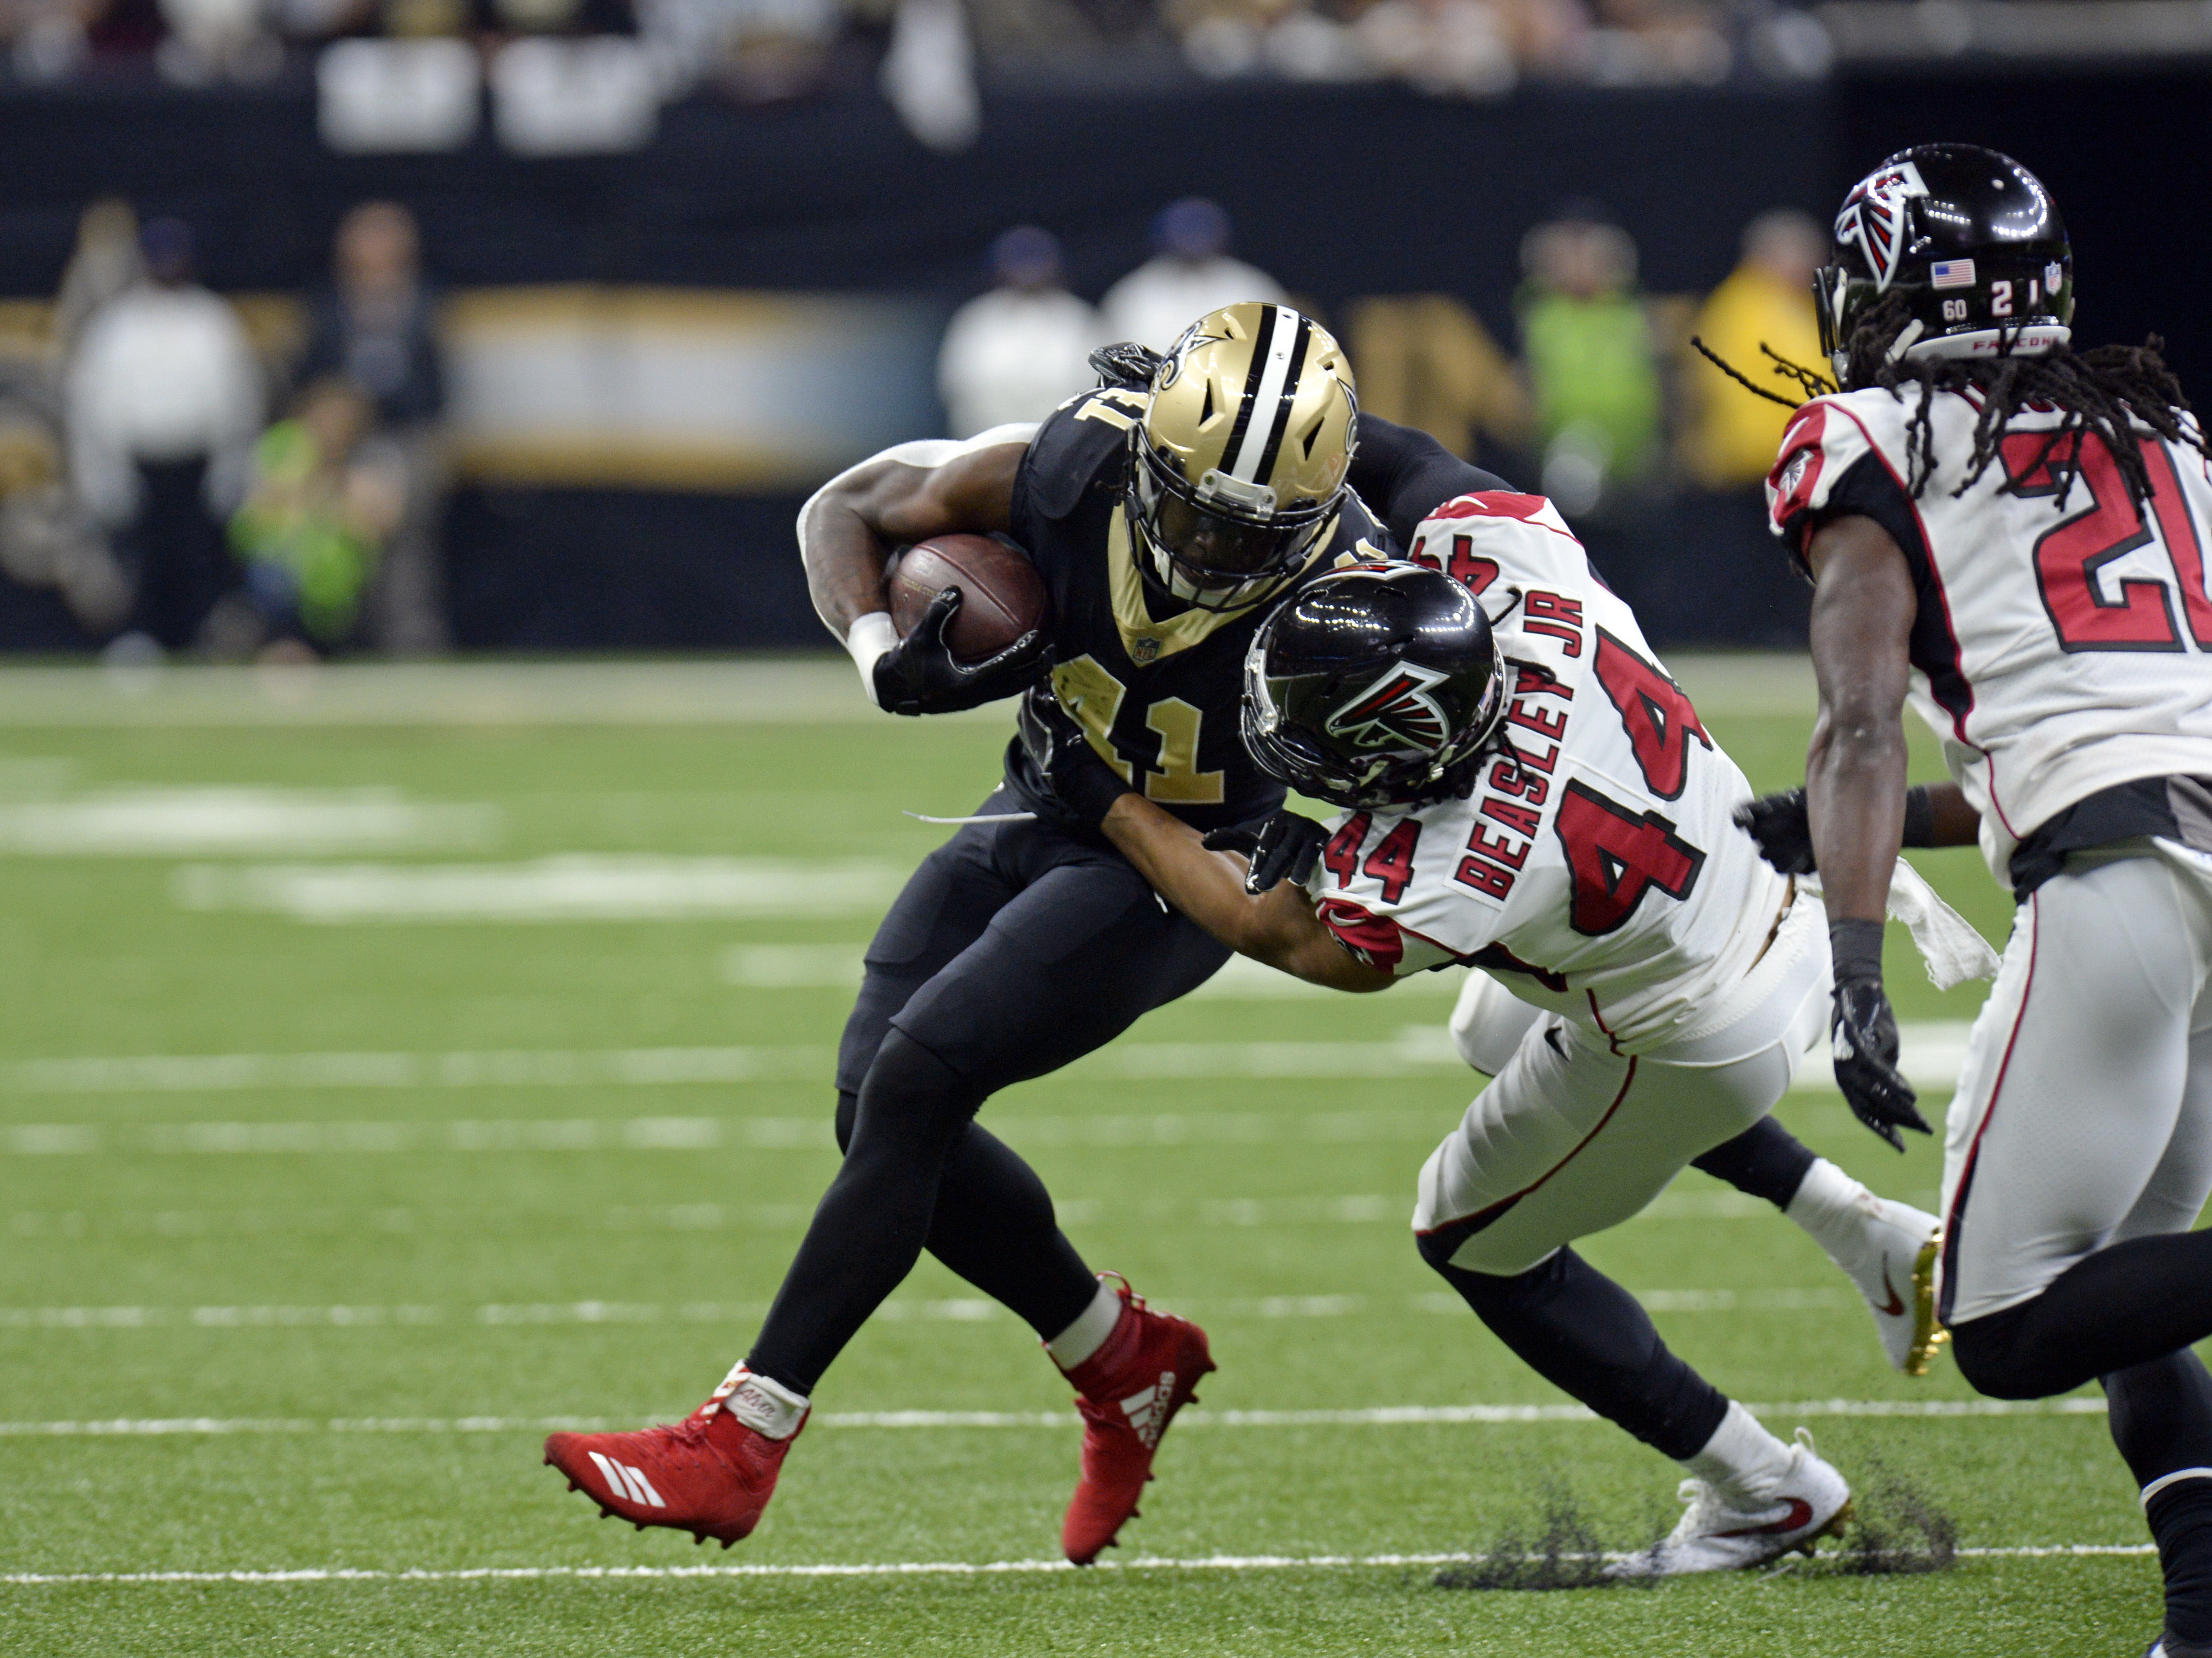 Falcons outside linebacker Vic Beasley (44) tries to tackle Saints running back Alvin Kamara (left) on December 24, 2017.